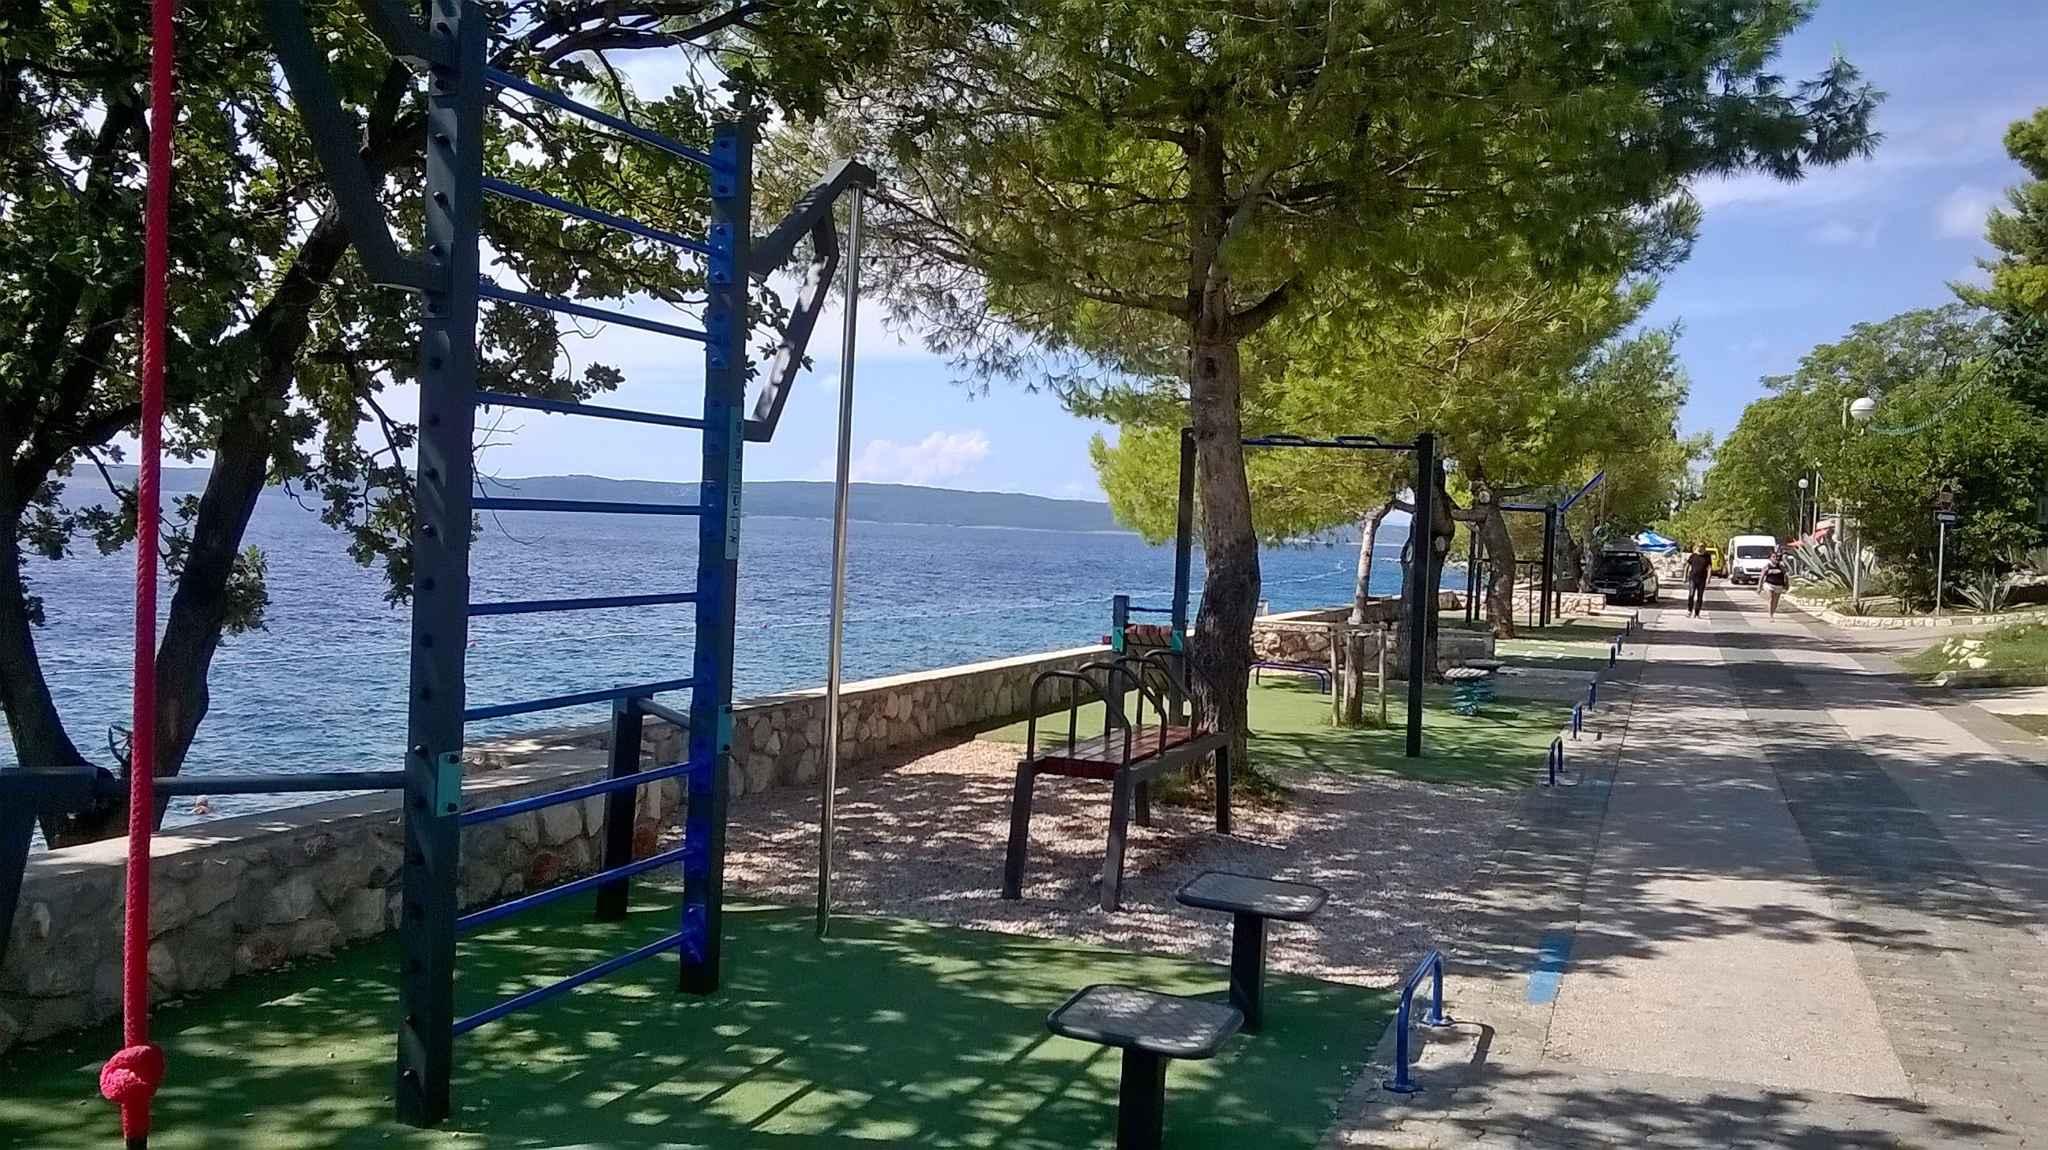 Appartement de vacances nahe von Meer, WI-FI, Klima (2182509), Novi Vinodolski, , Kvarner, Croatie, image 18